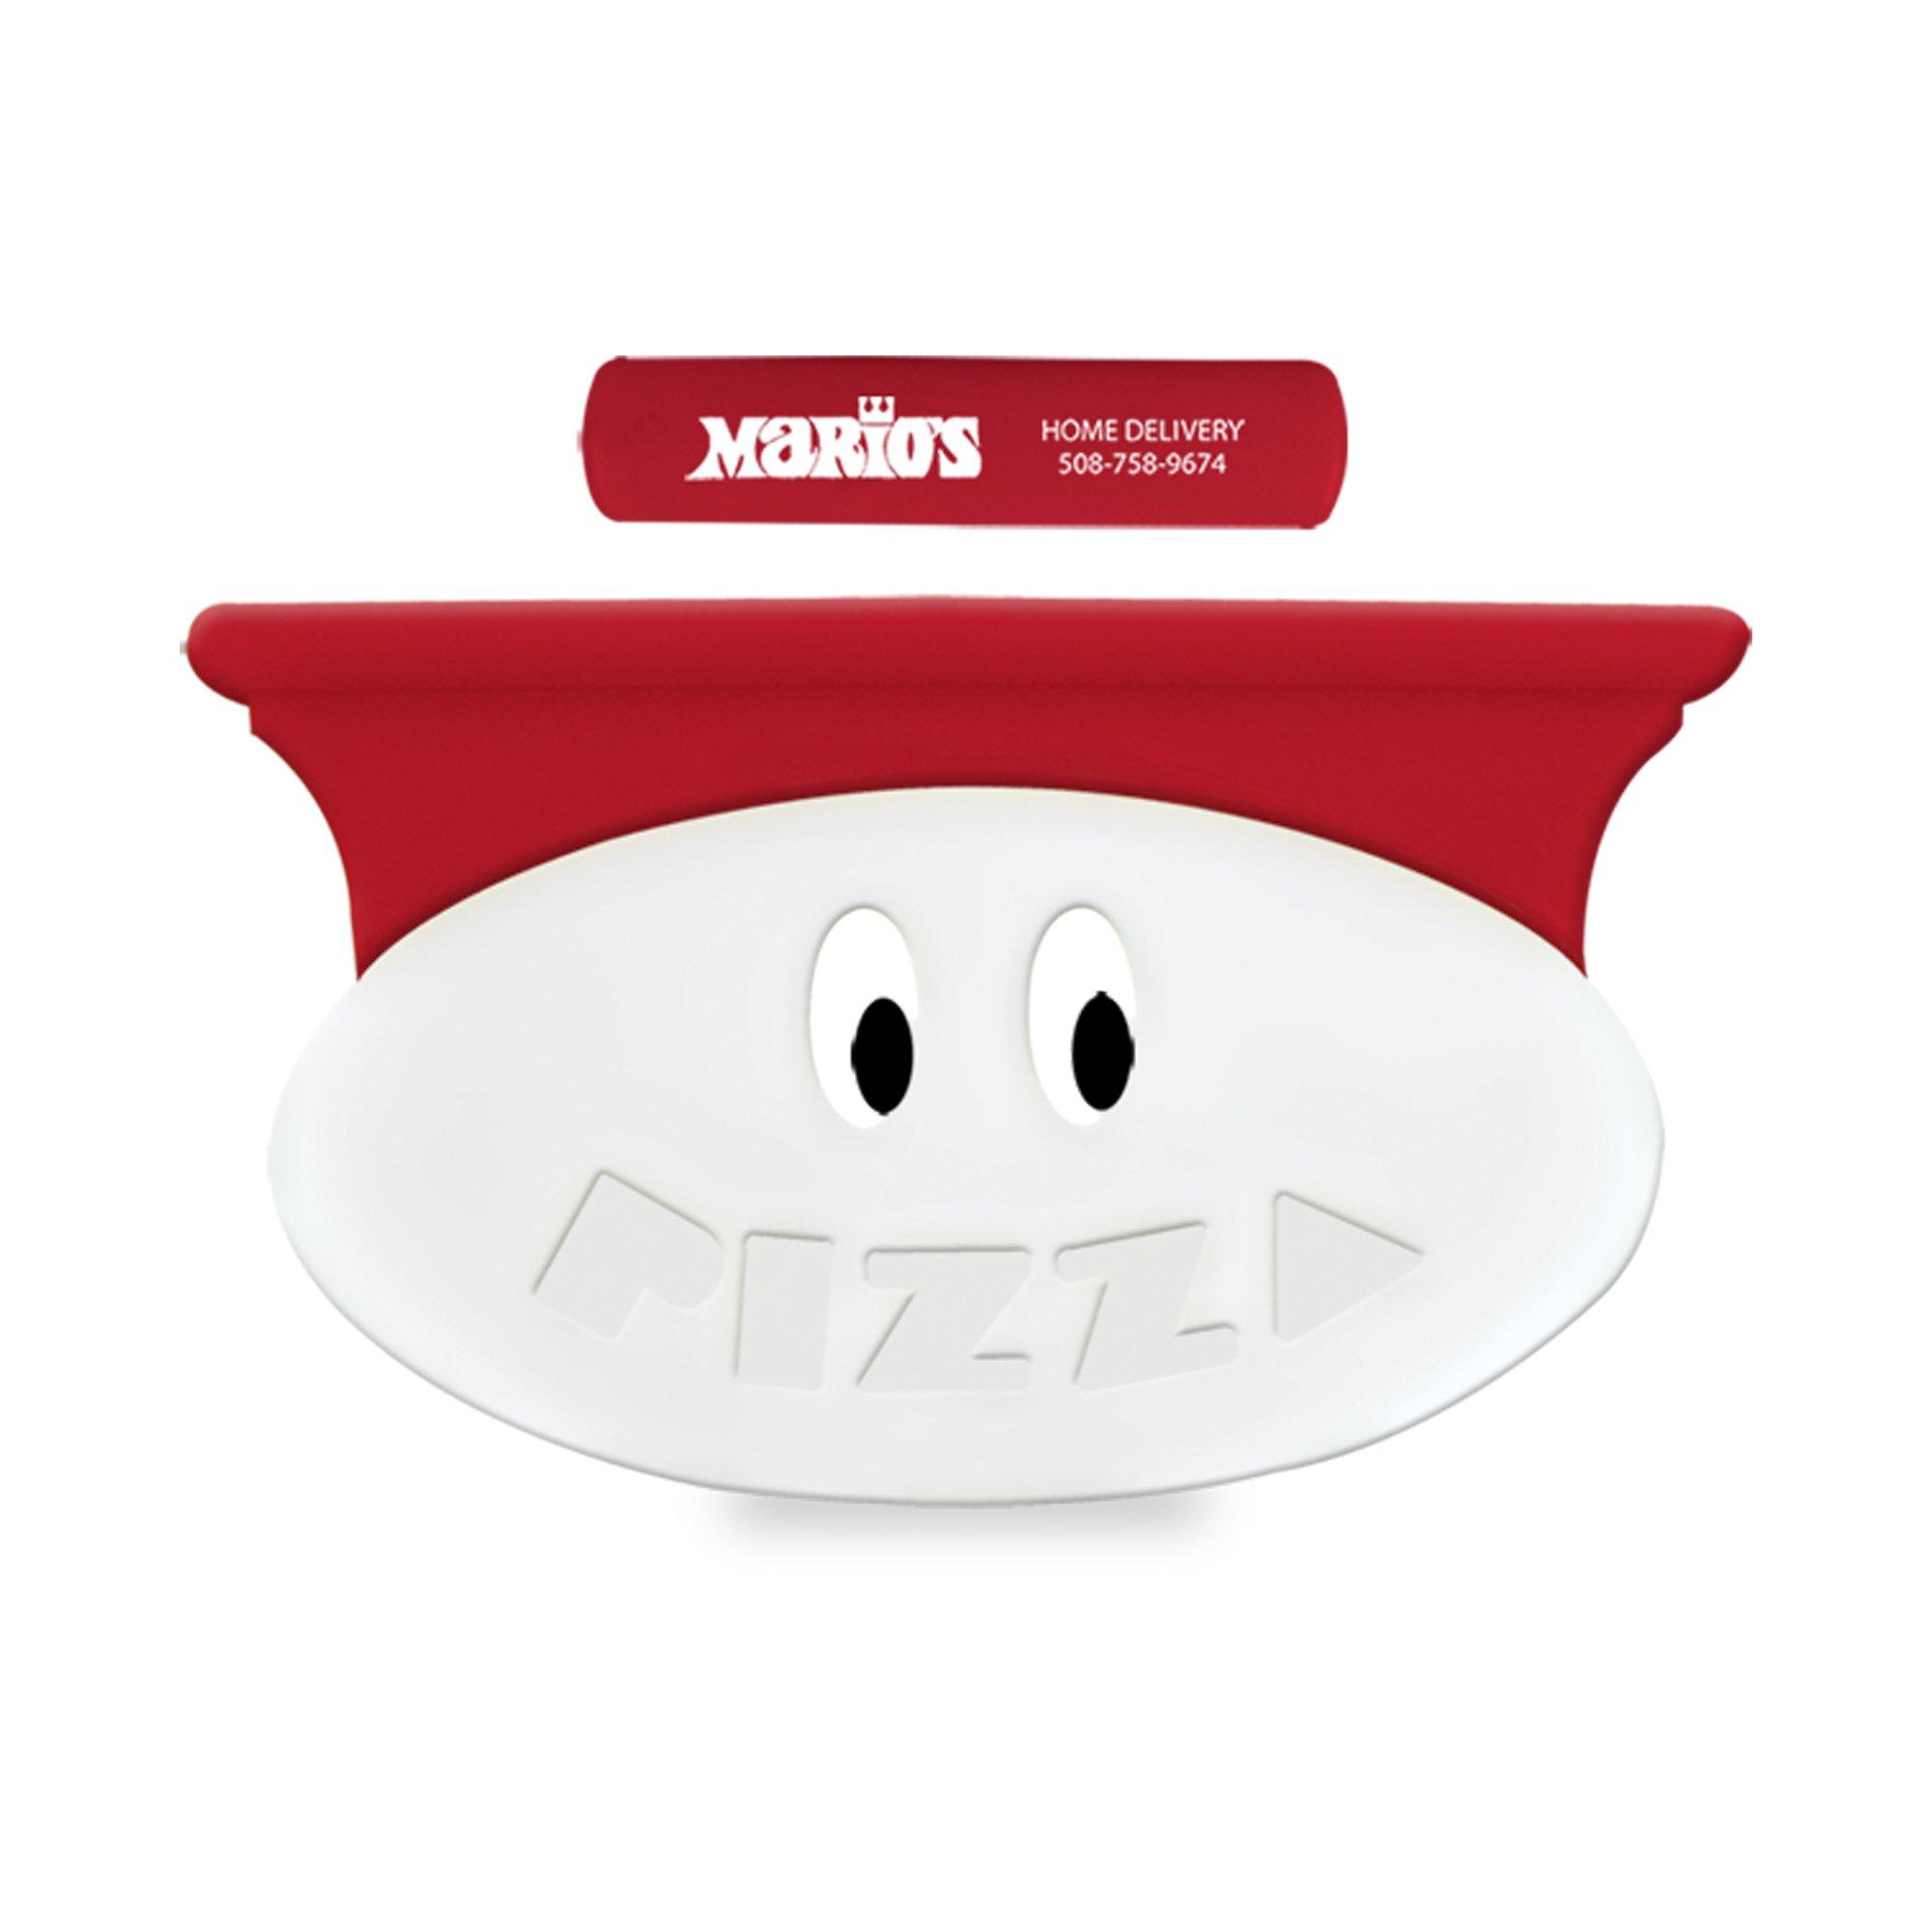 Logo Kuzil Krazy Rolling Plastic Novelty Pizza Cutter National Pen